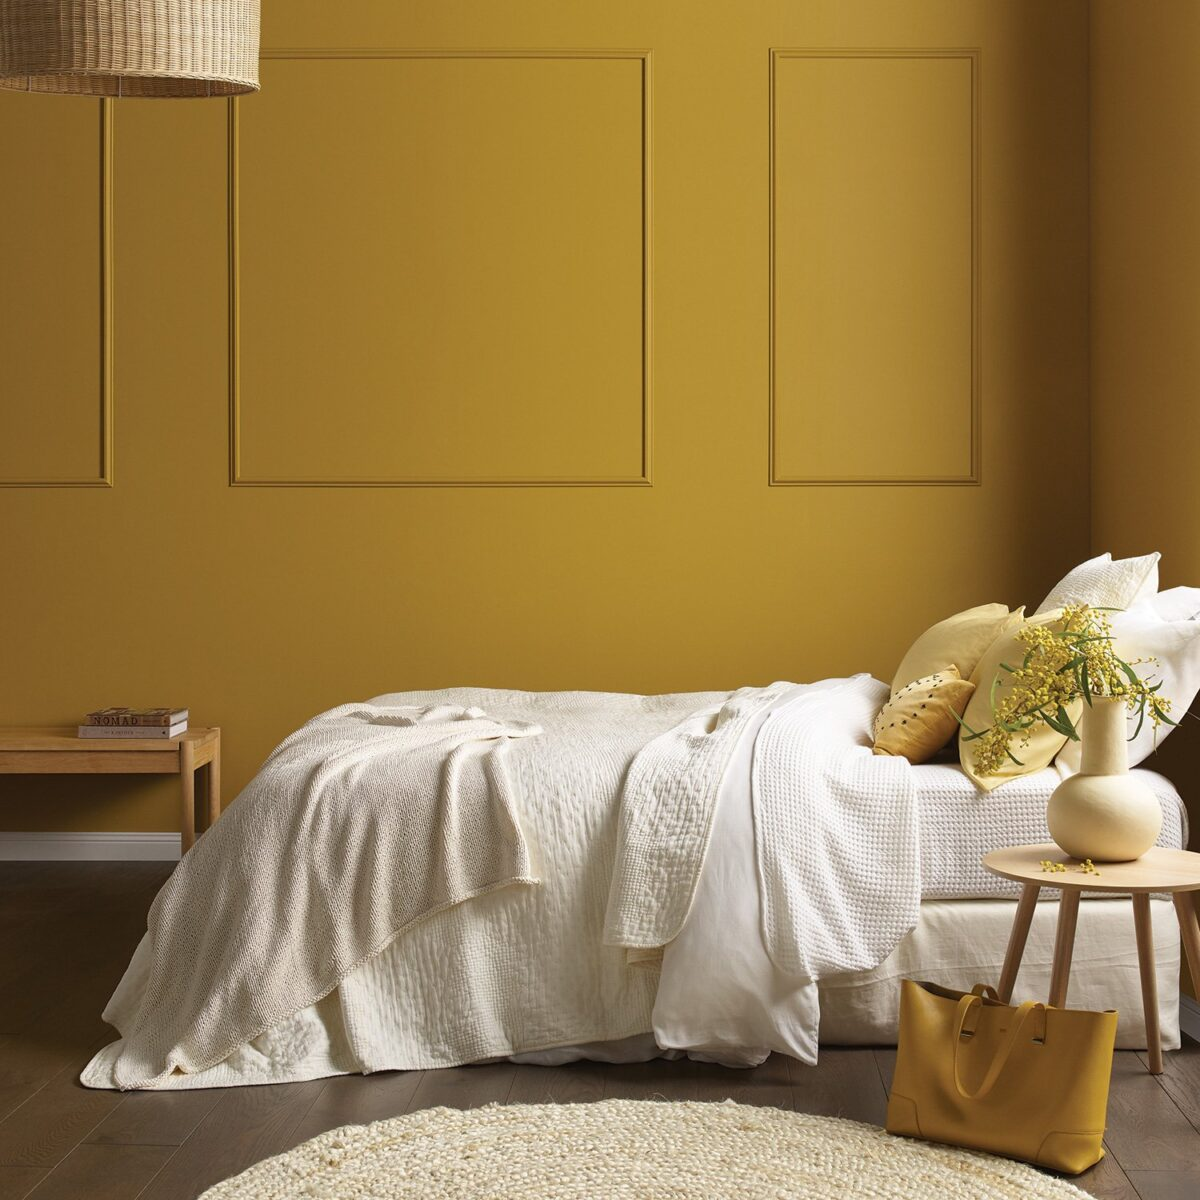 color-turmeric-ideas-walls-home-bed